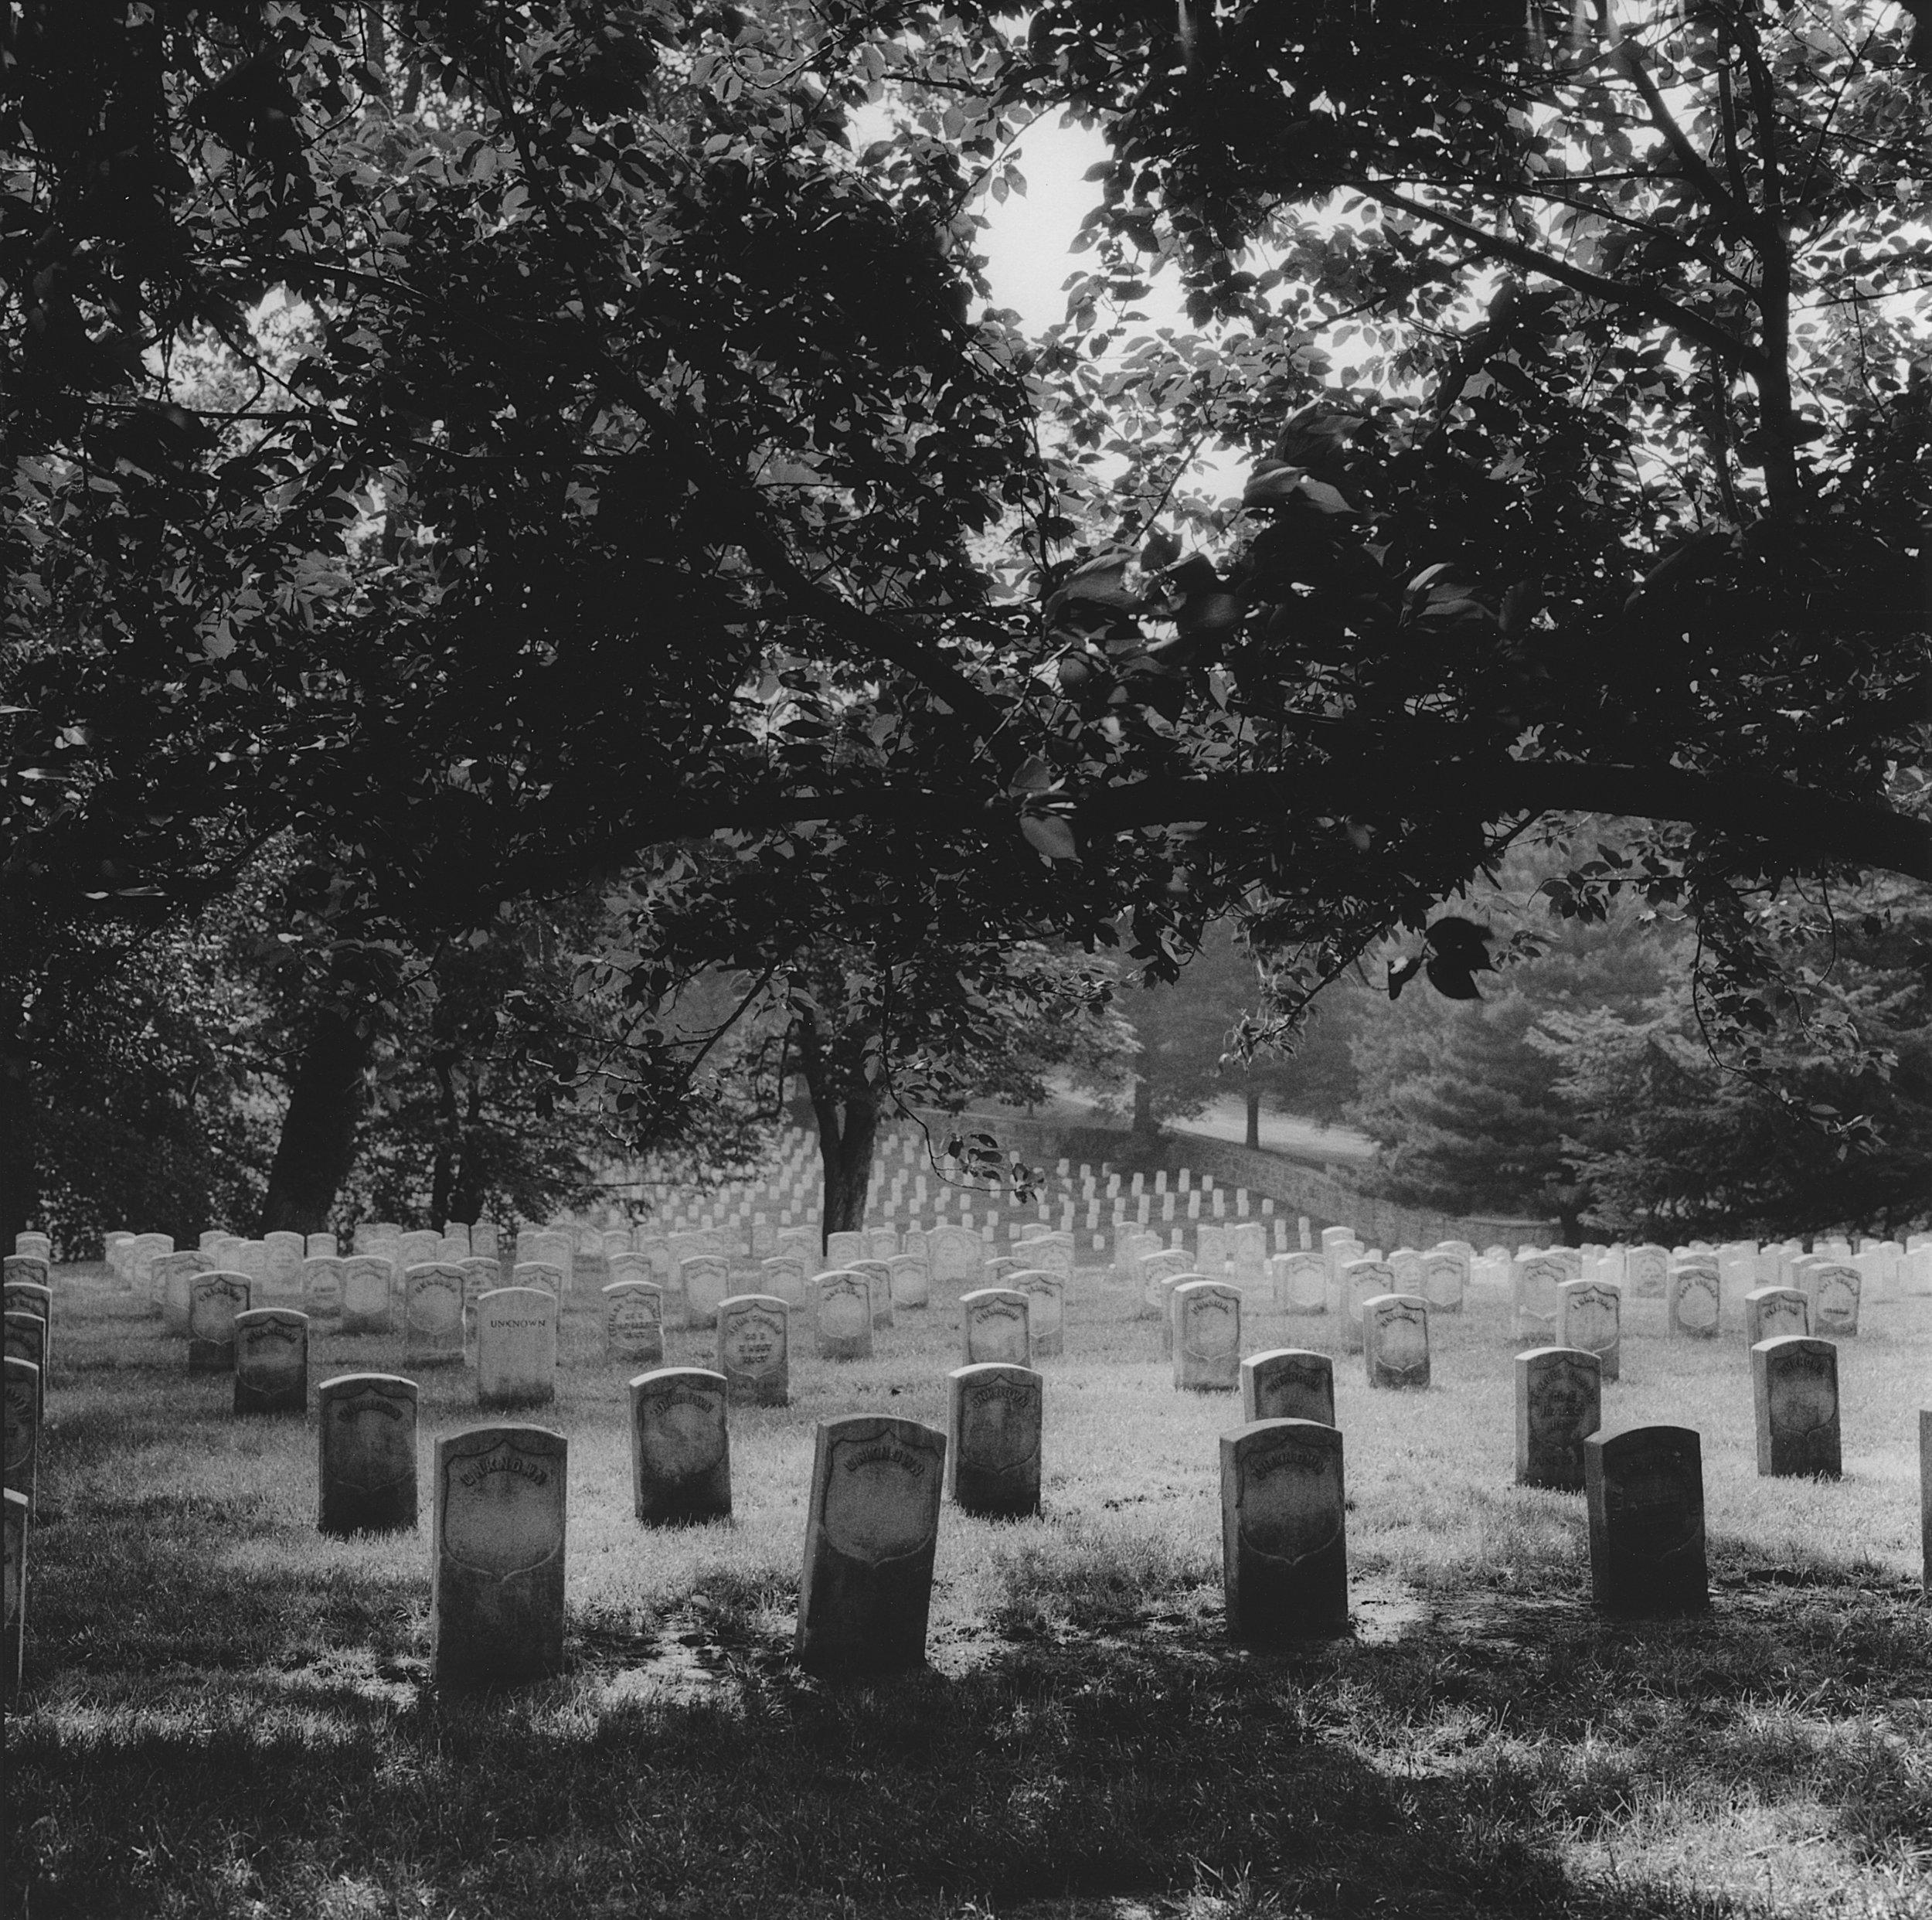 Arlington National Cemetery, Section 27, Arlington, Virginia, 2000